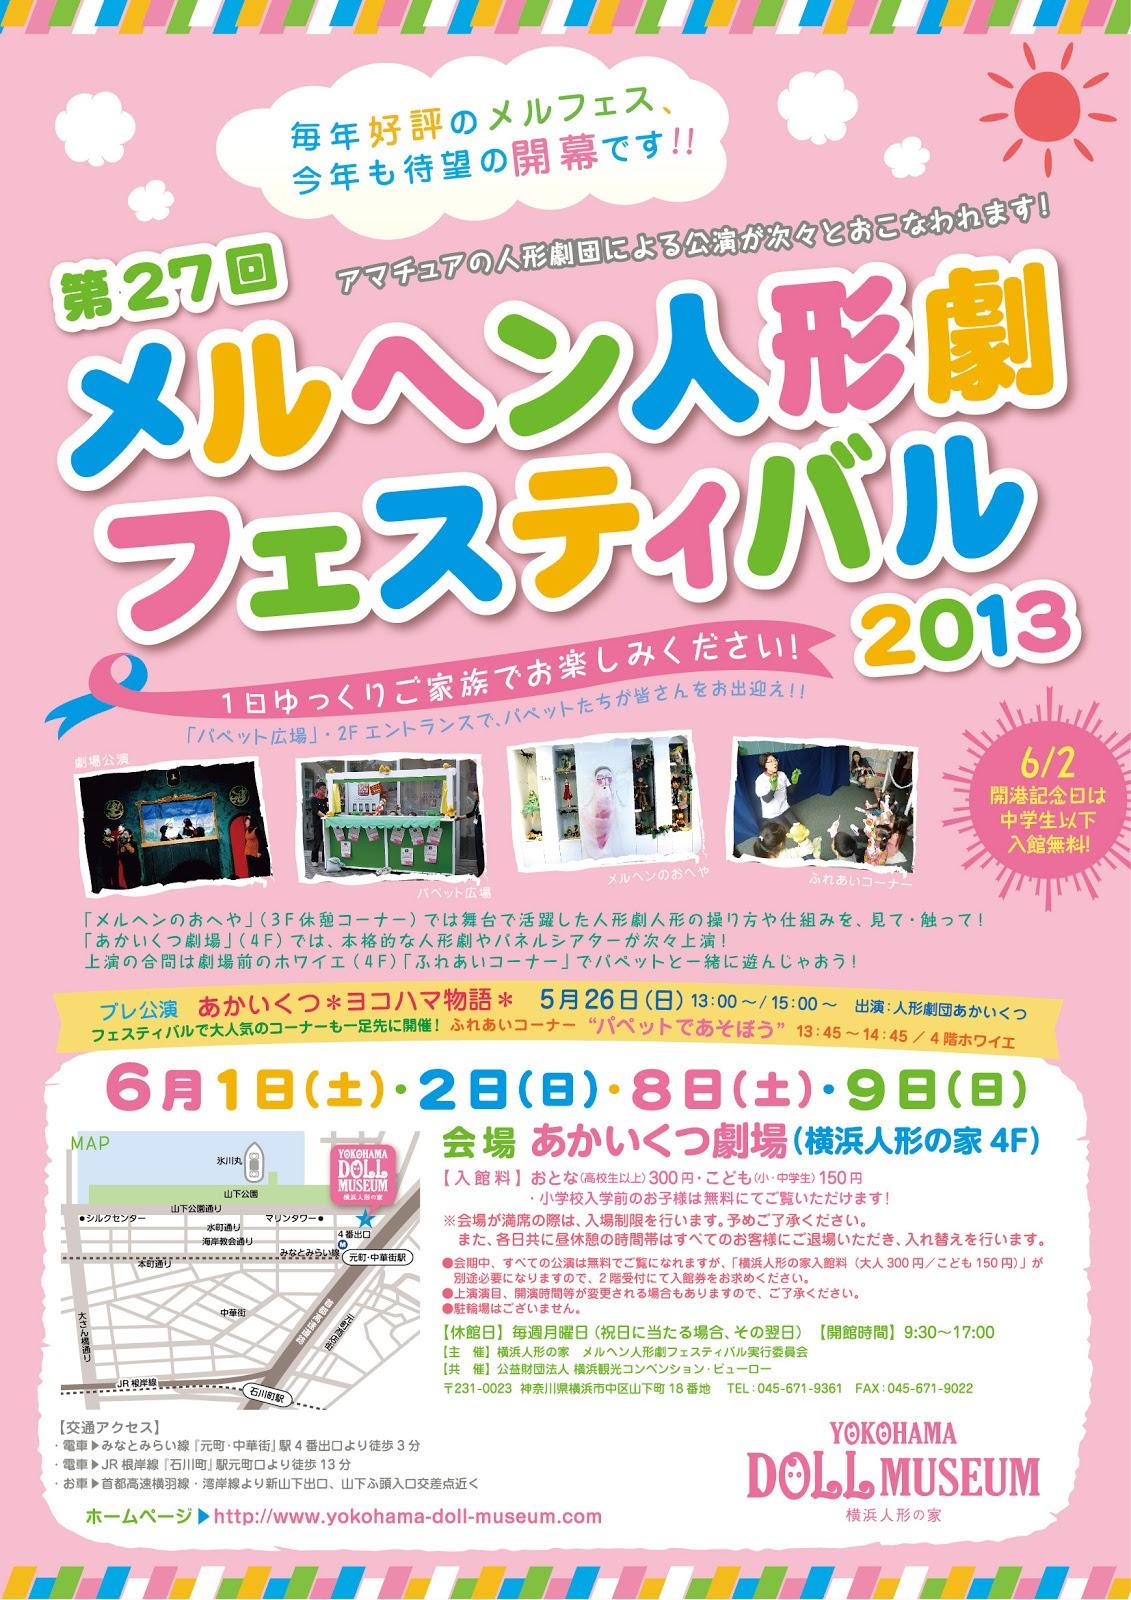 D6_210x297_melfes2013_pink.jpg